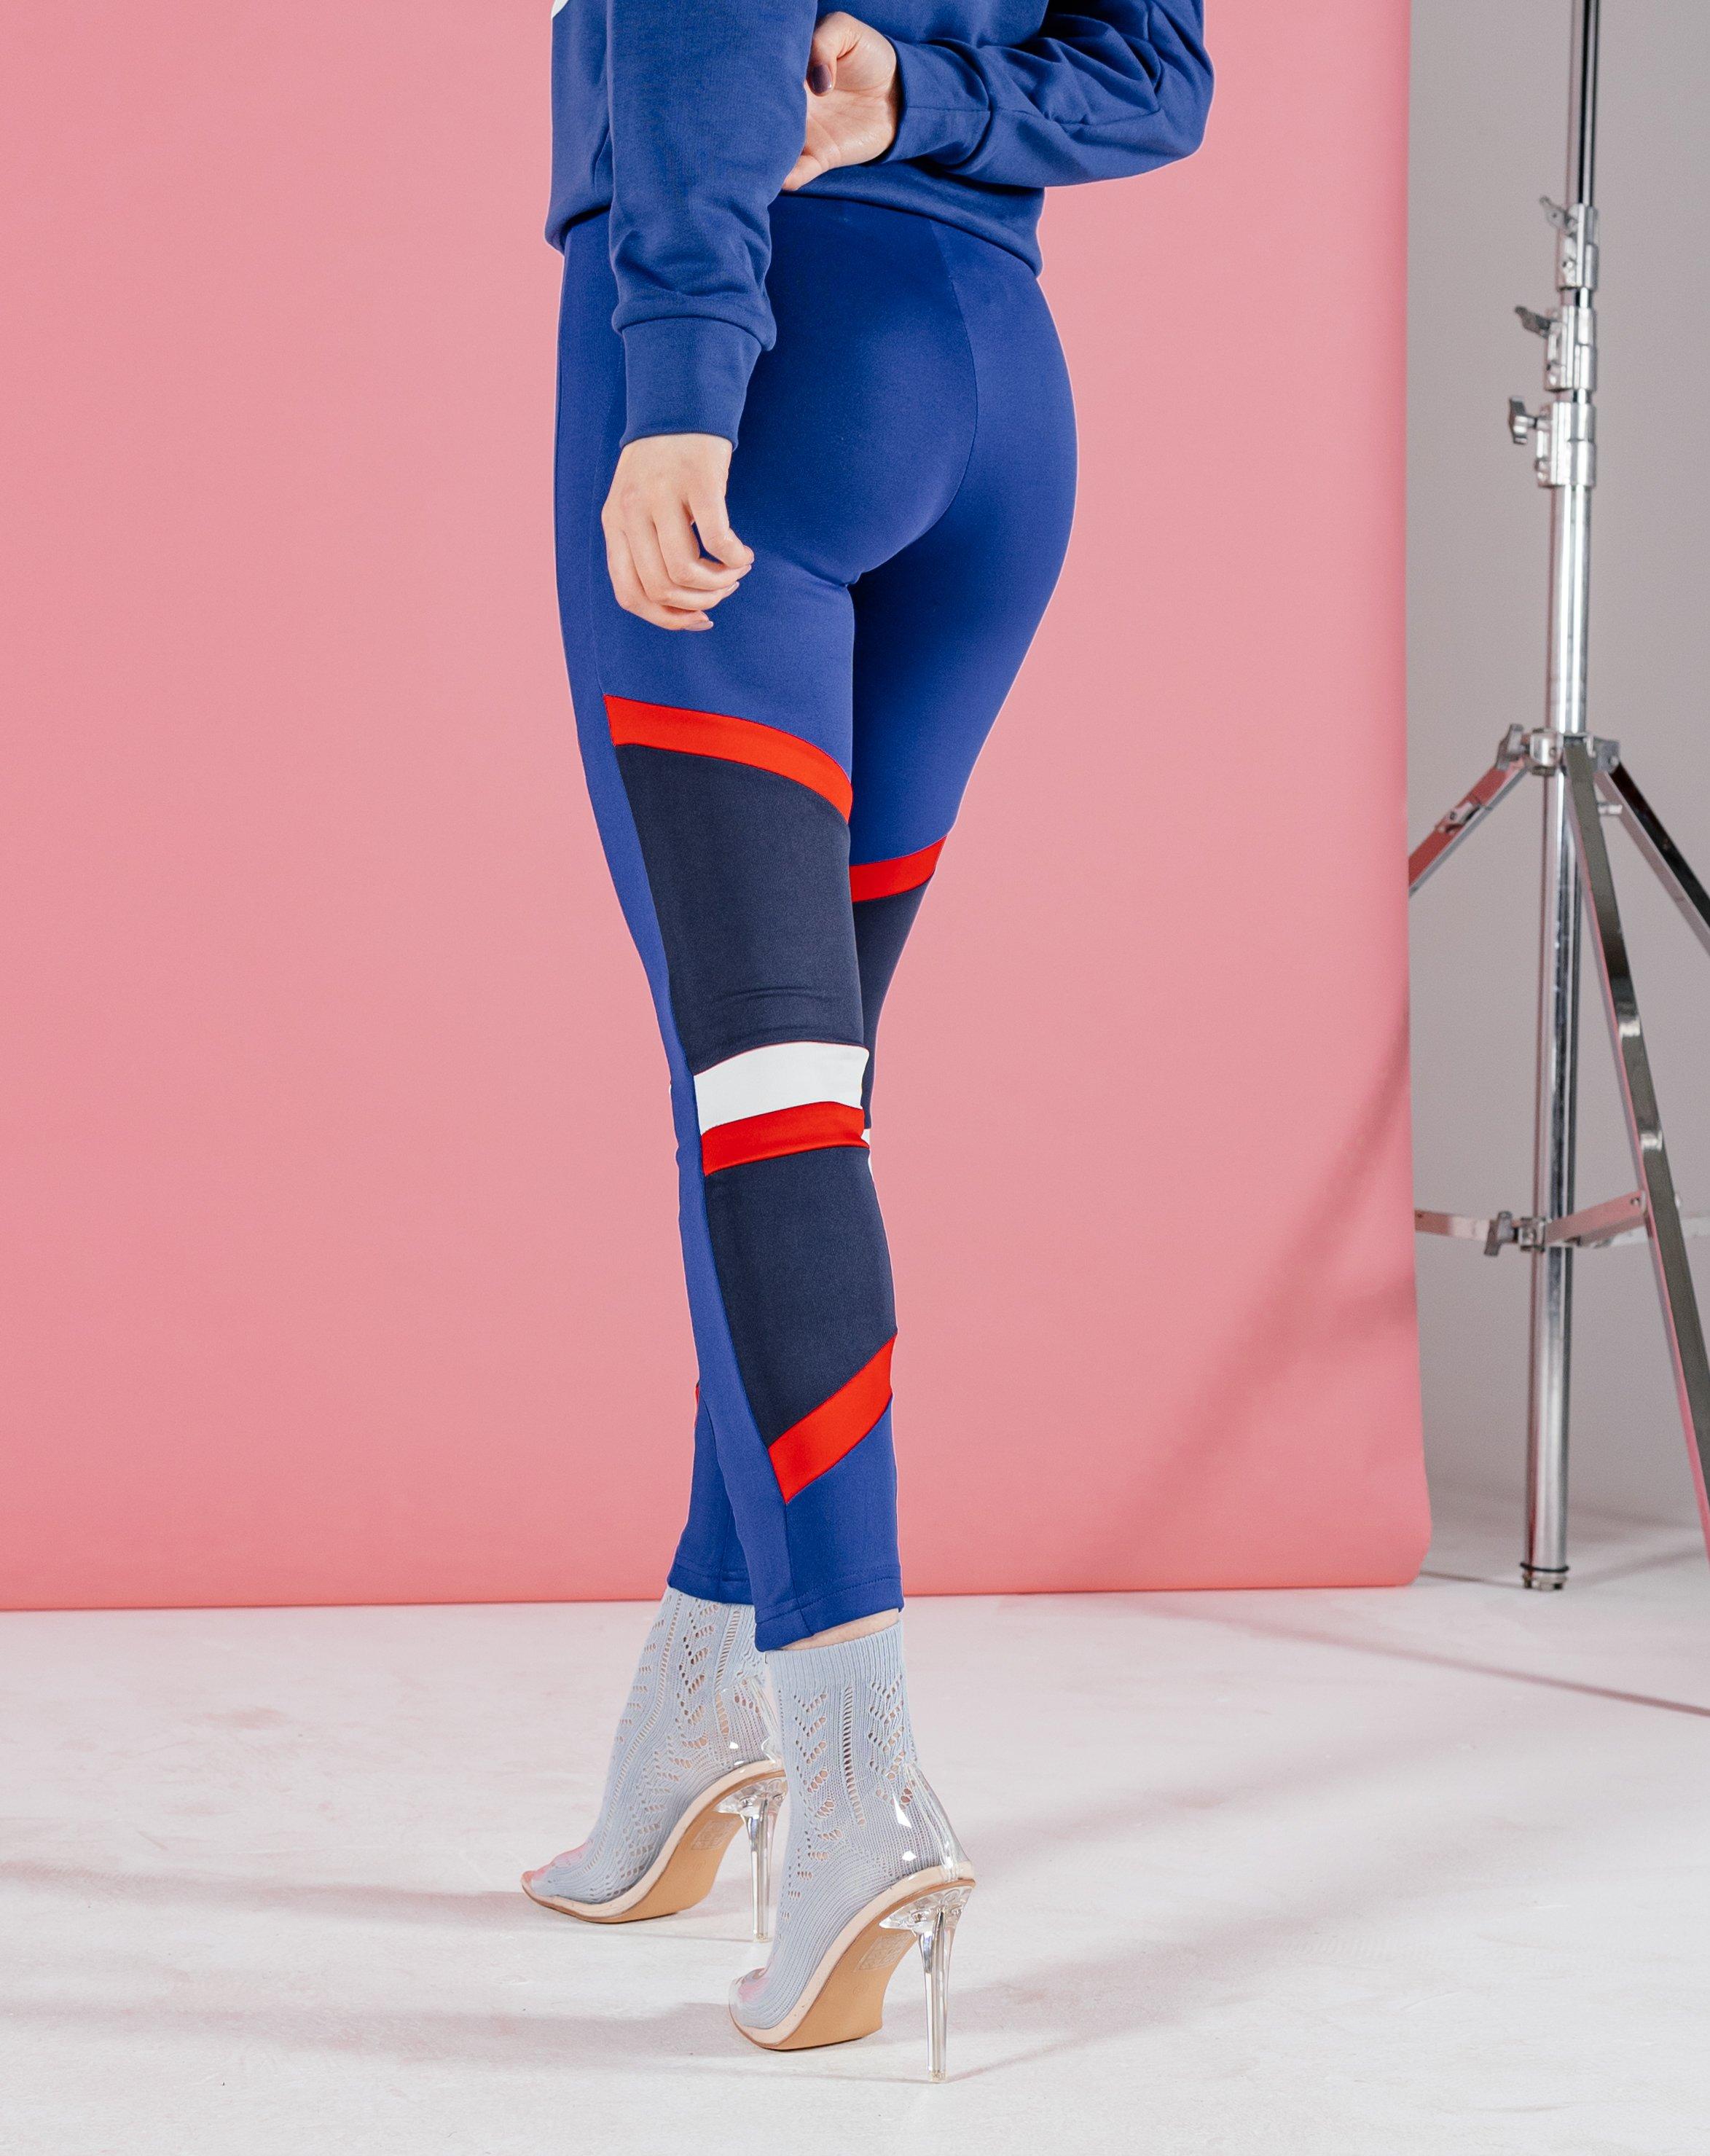 Tandil Women's Leggings With Chevron Tape - Navy / 10